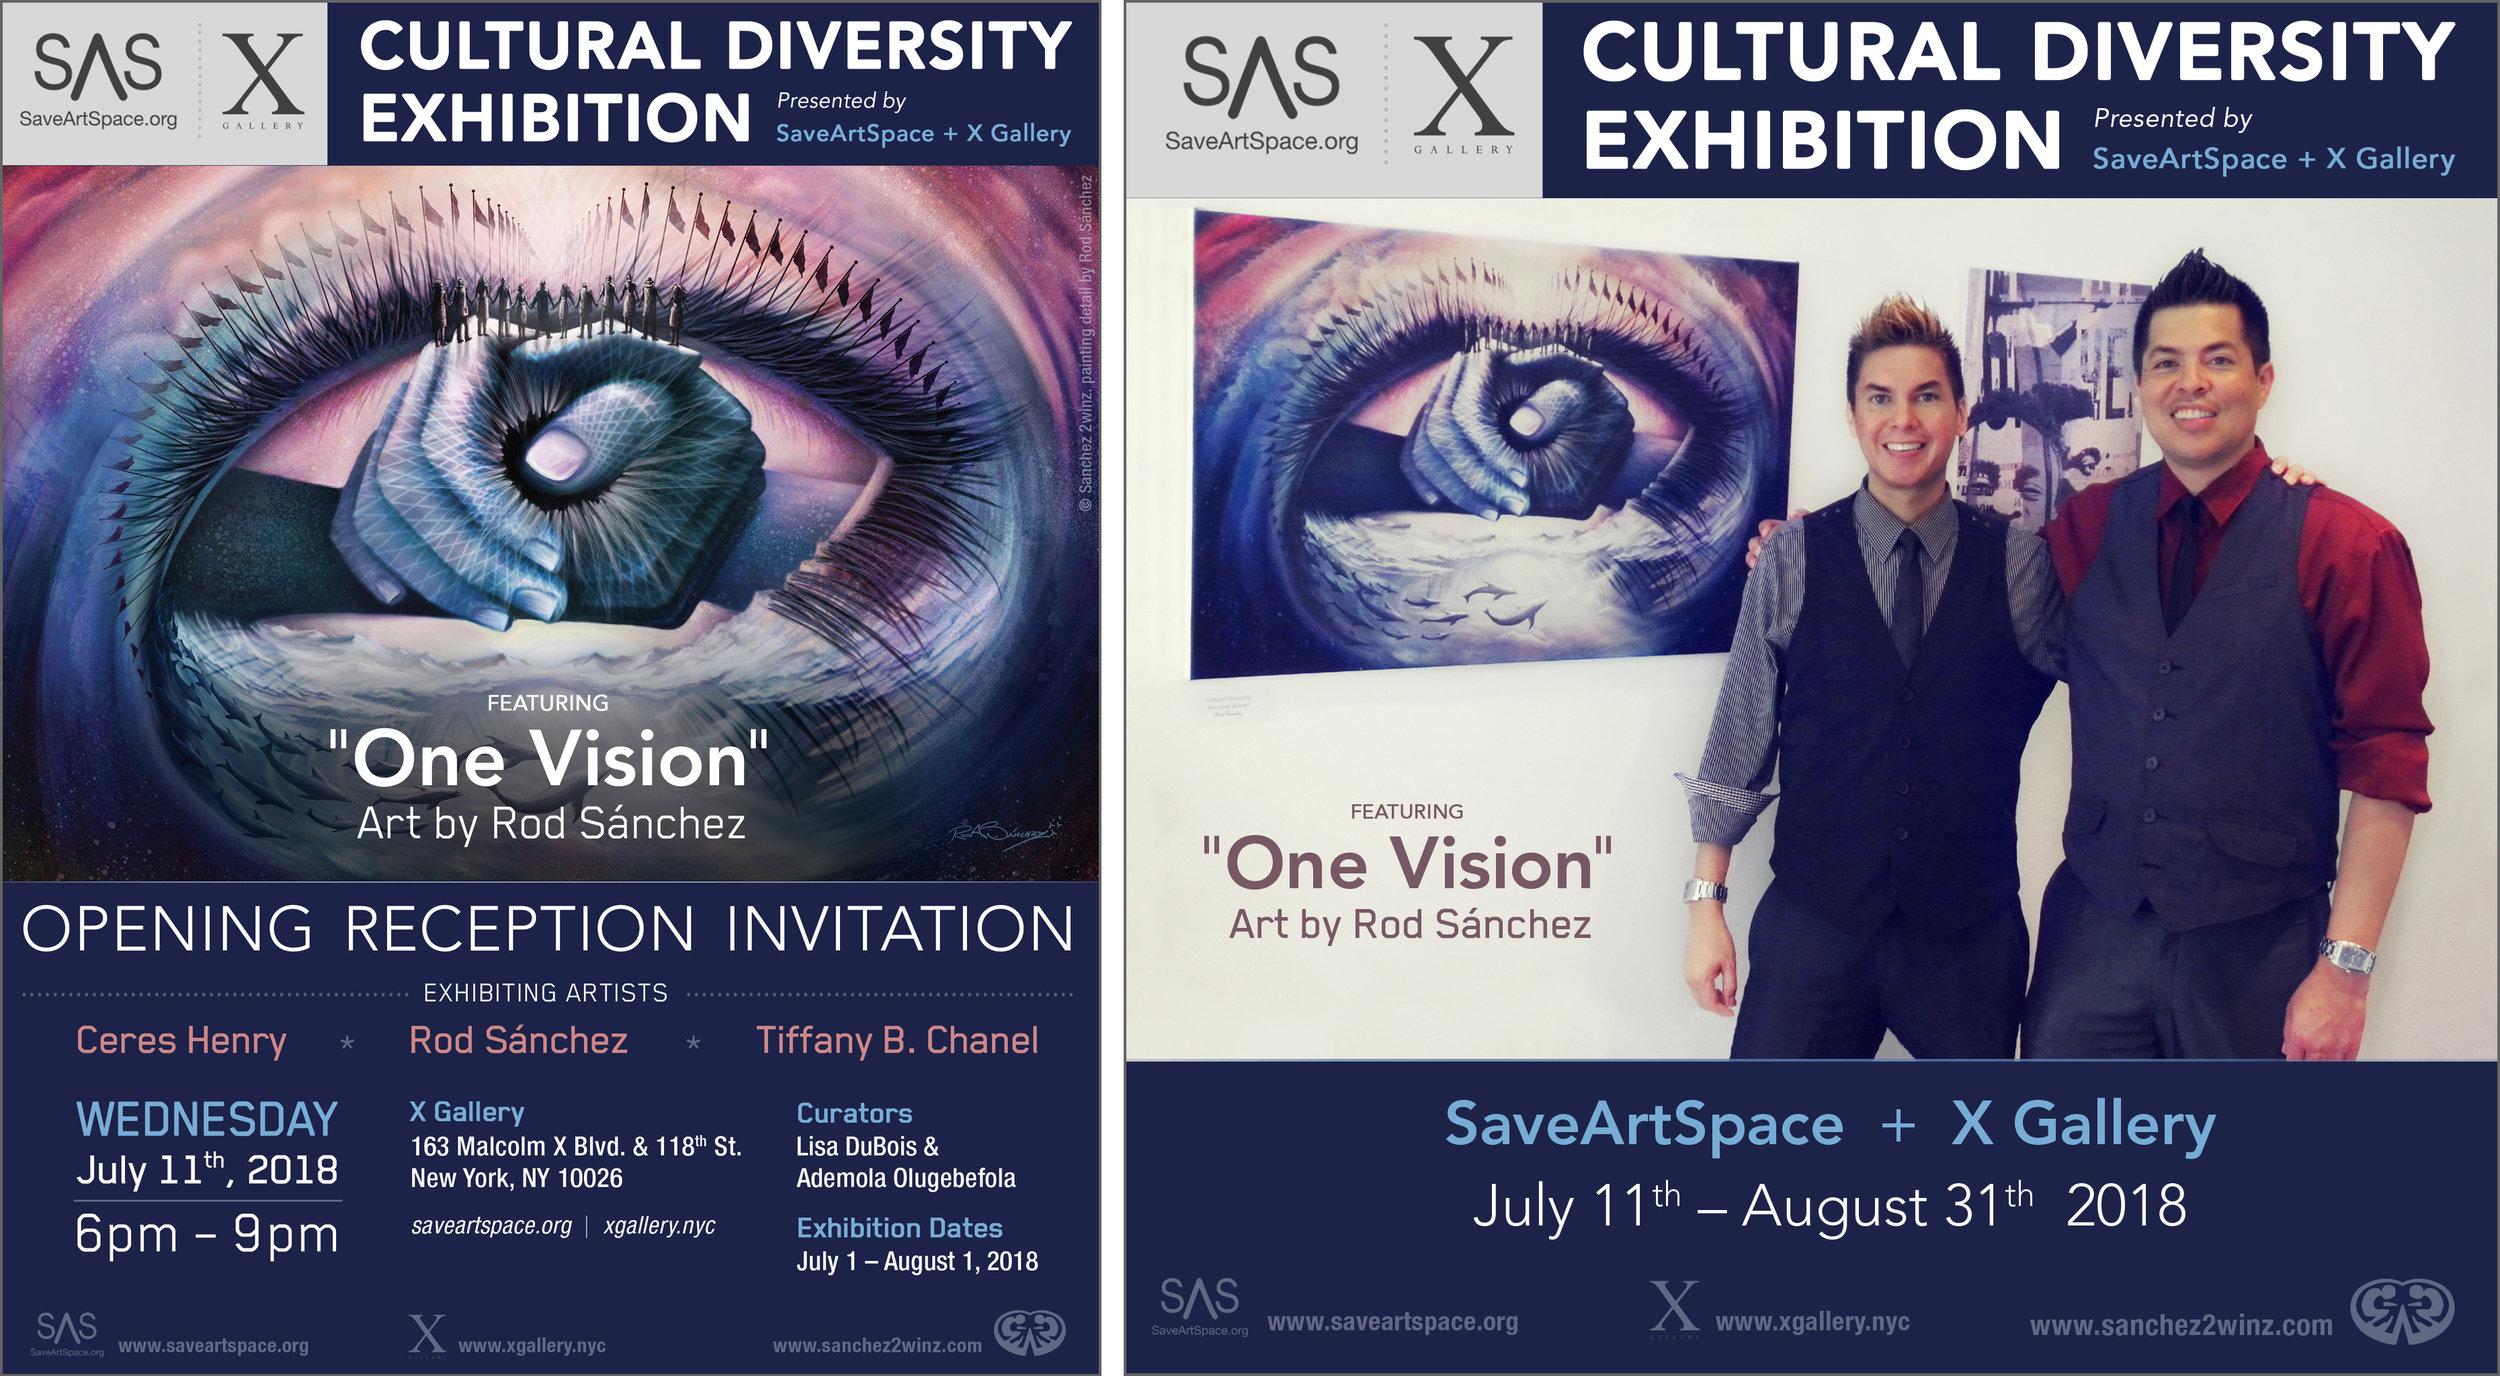 News_SaveArtSpace_XGallery_Exhibition_OneVision_RodSanchez_Sanchez2winz.jpg